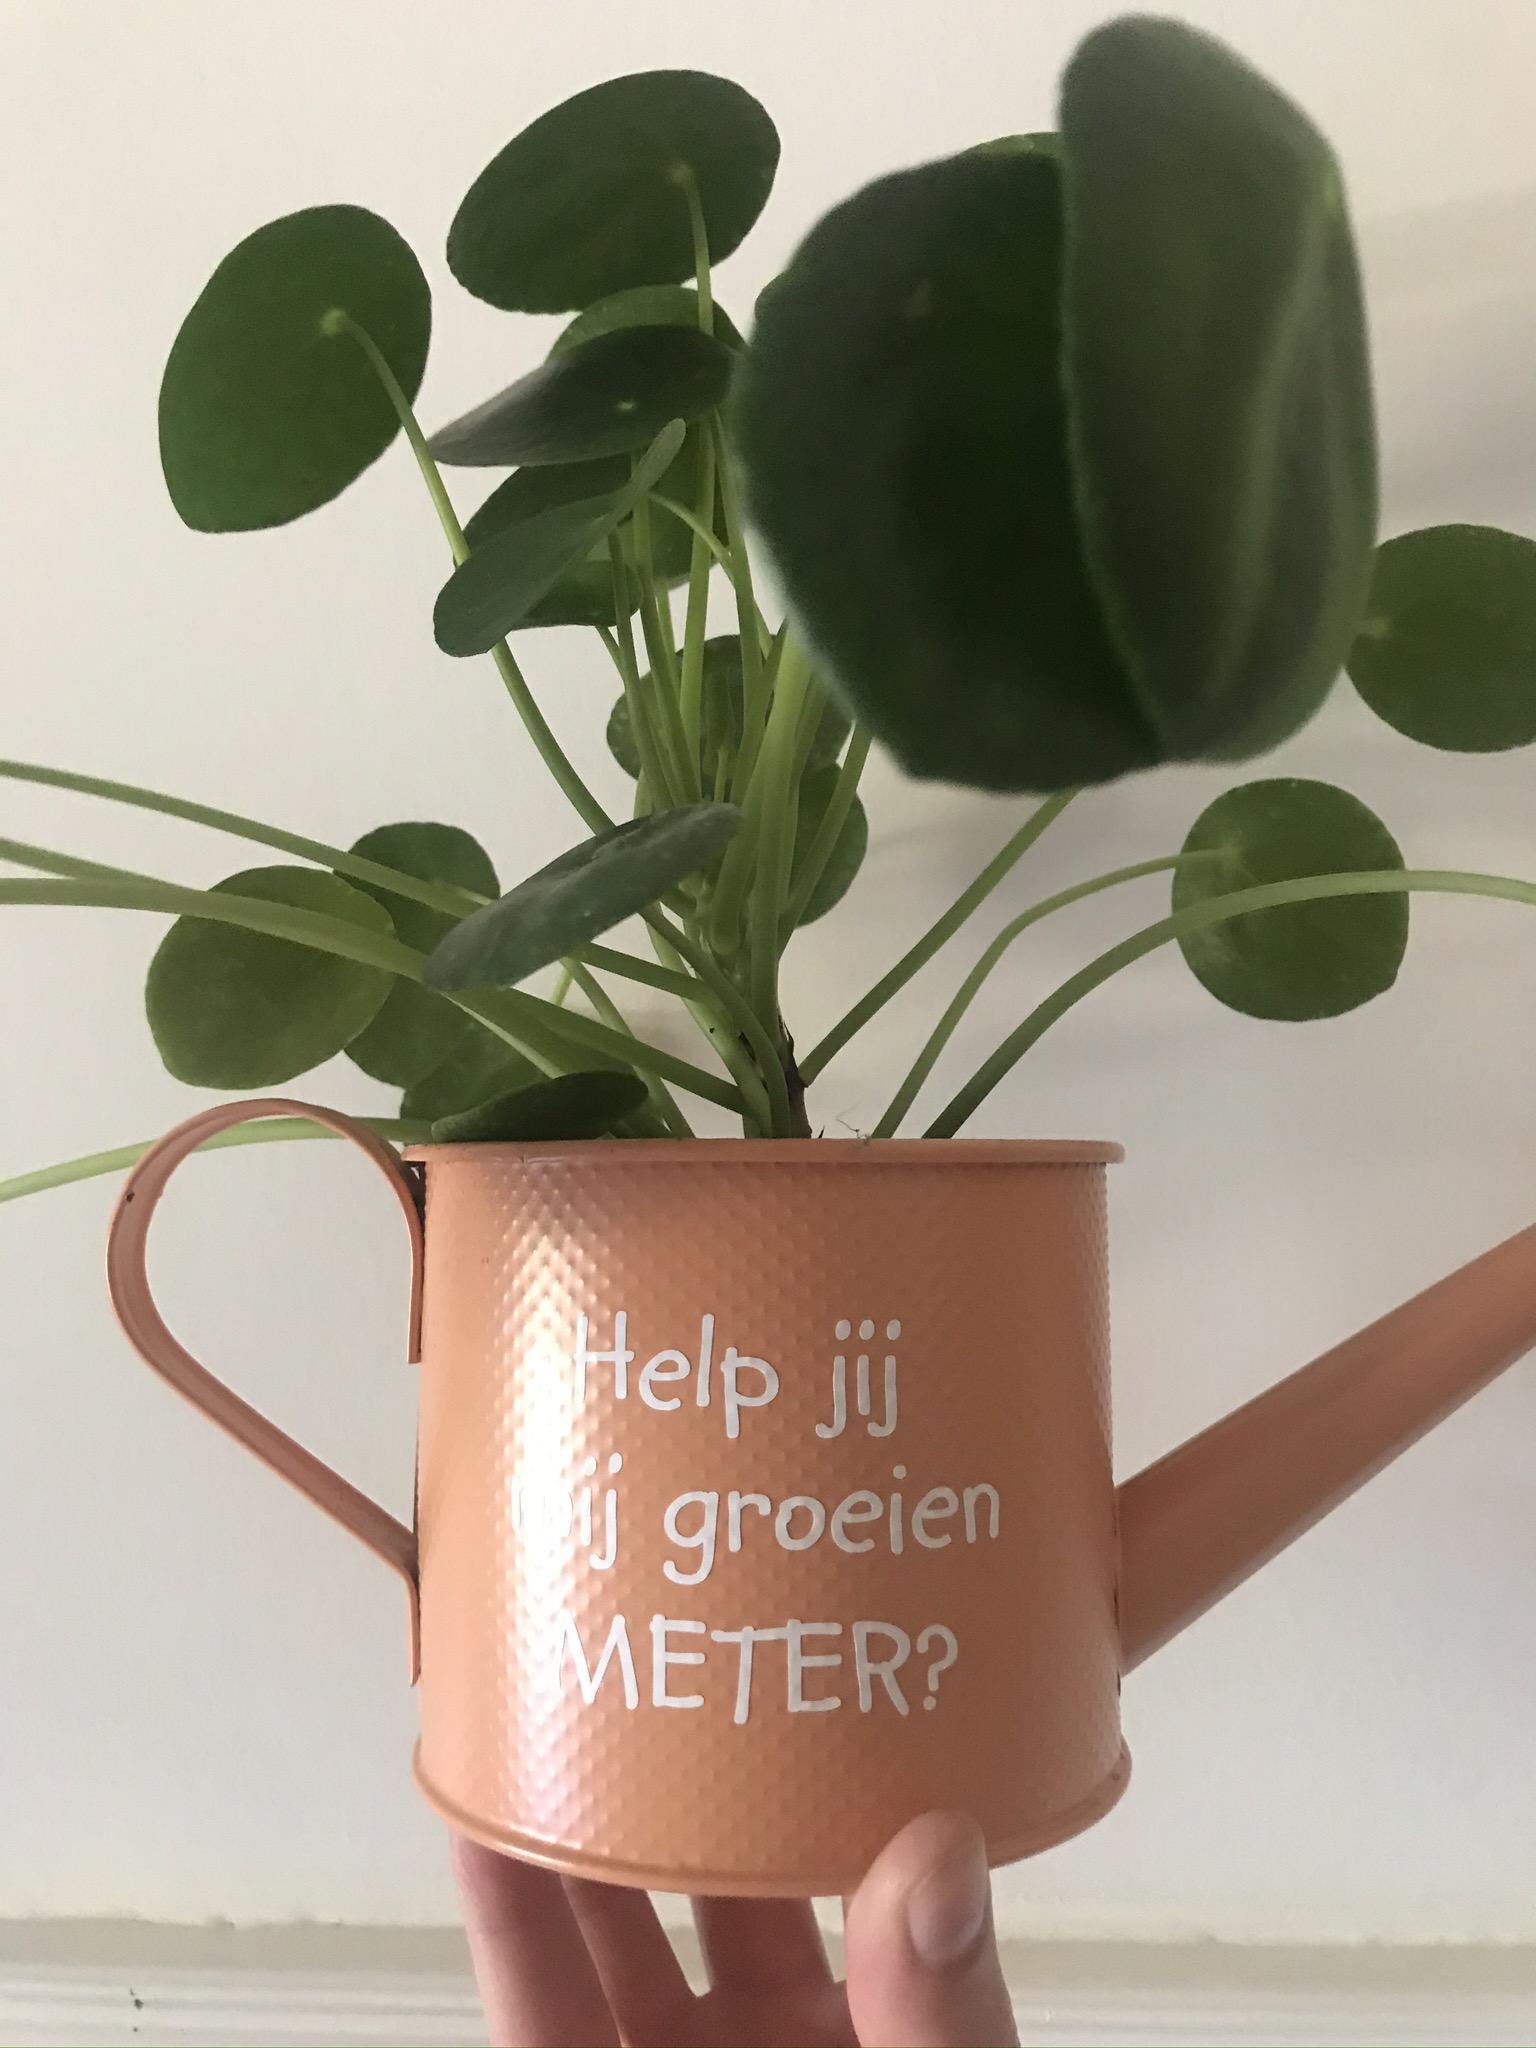 Meter en peter